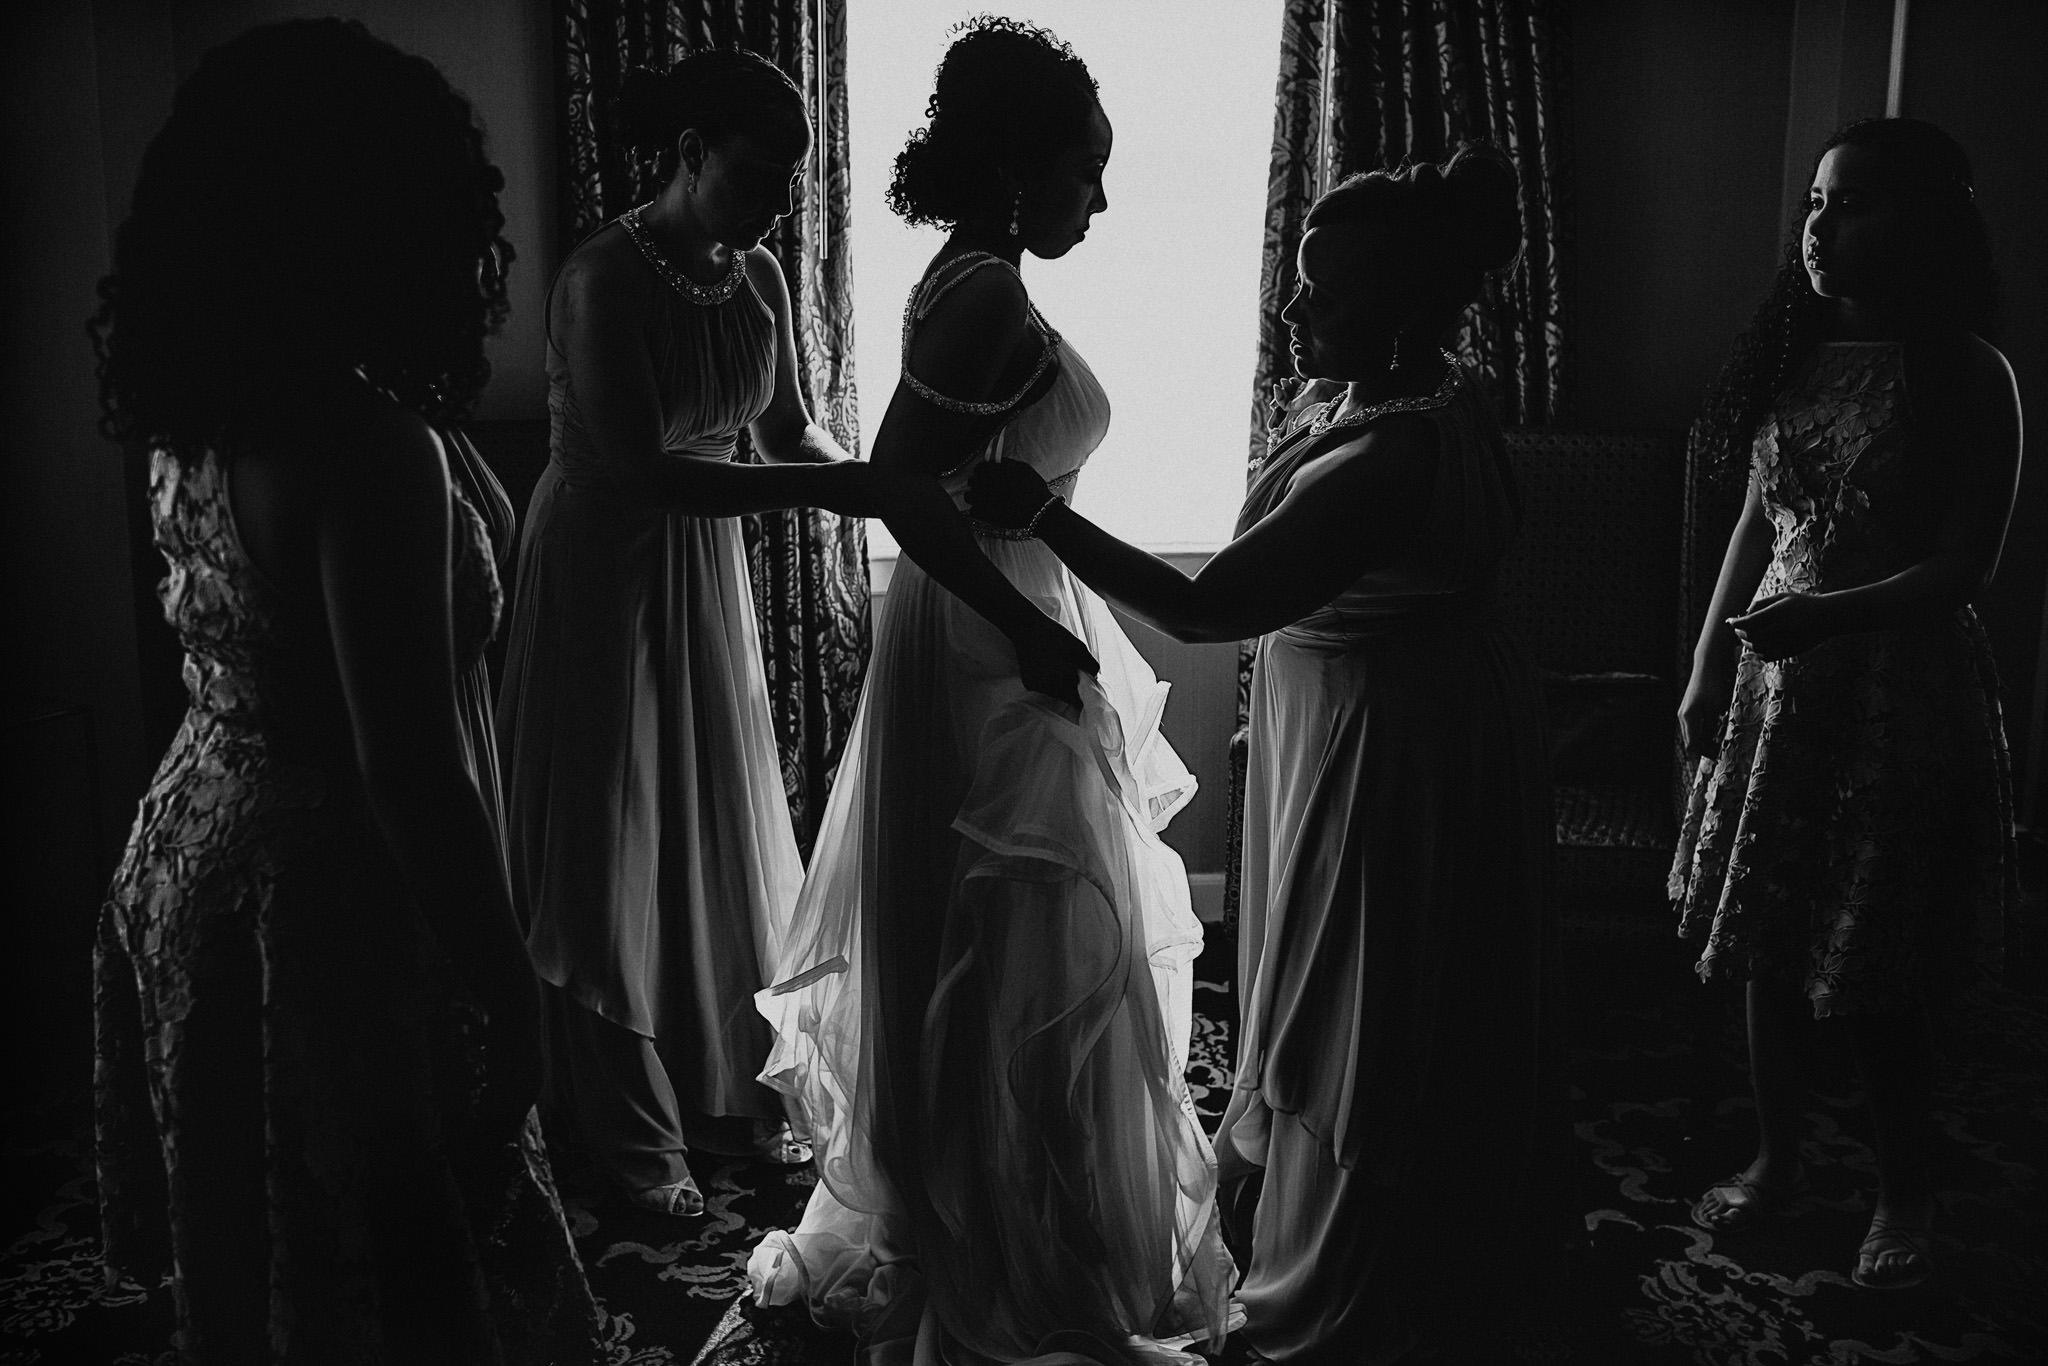 Bridesmaids help bride with her wedding dress